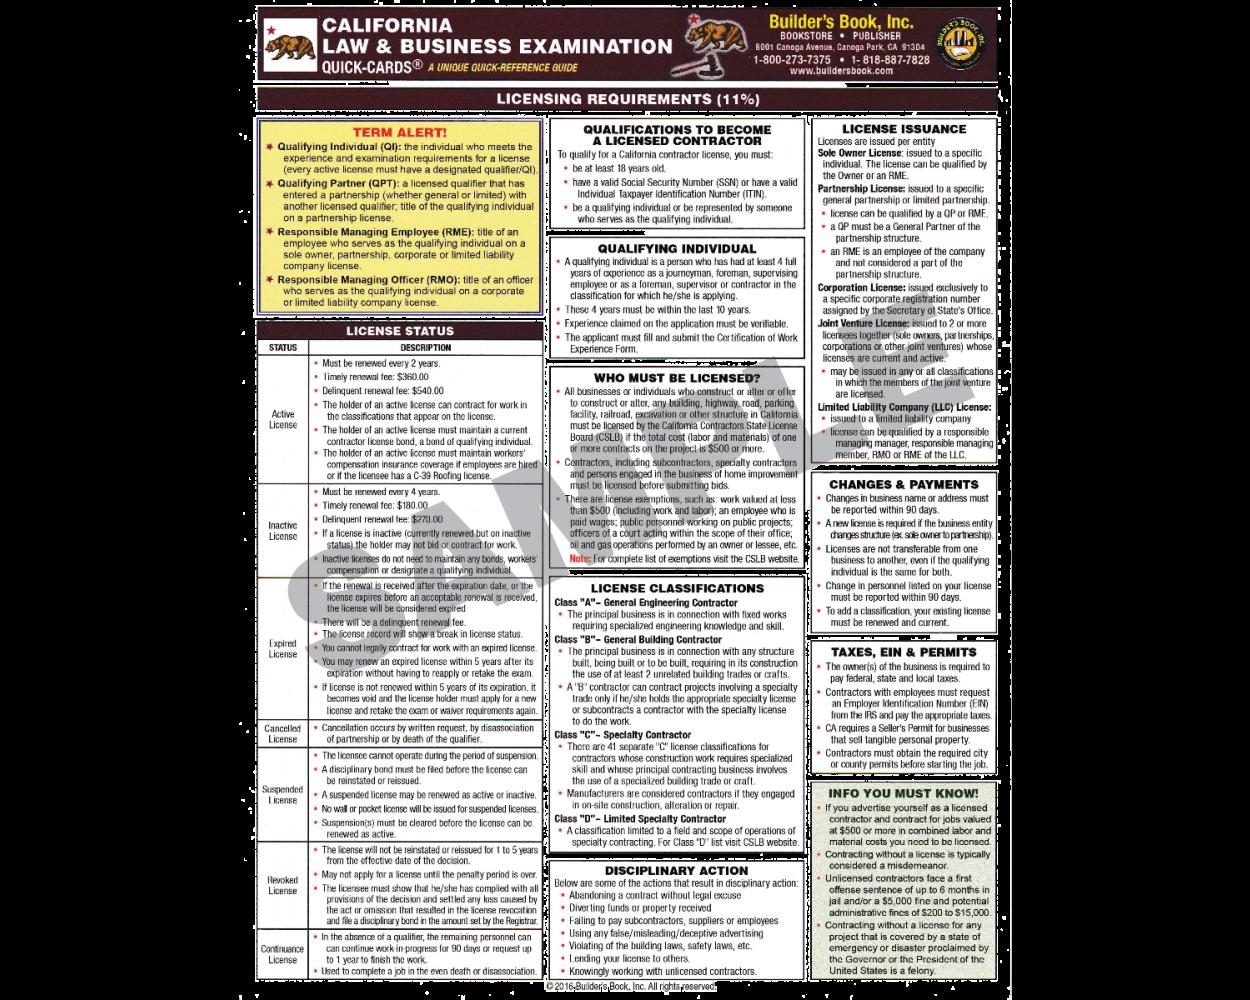 California Law & Business Exam Prep